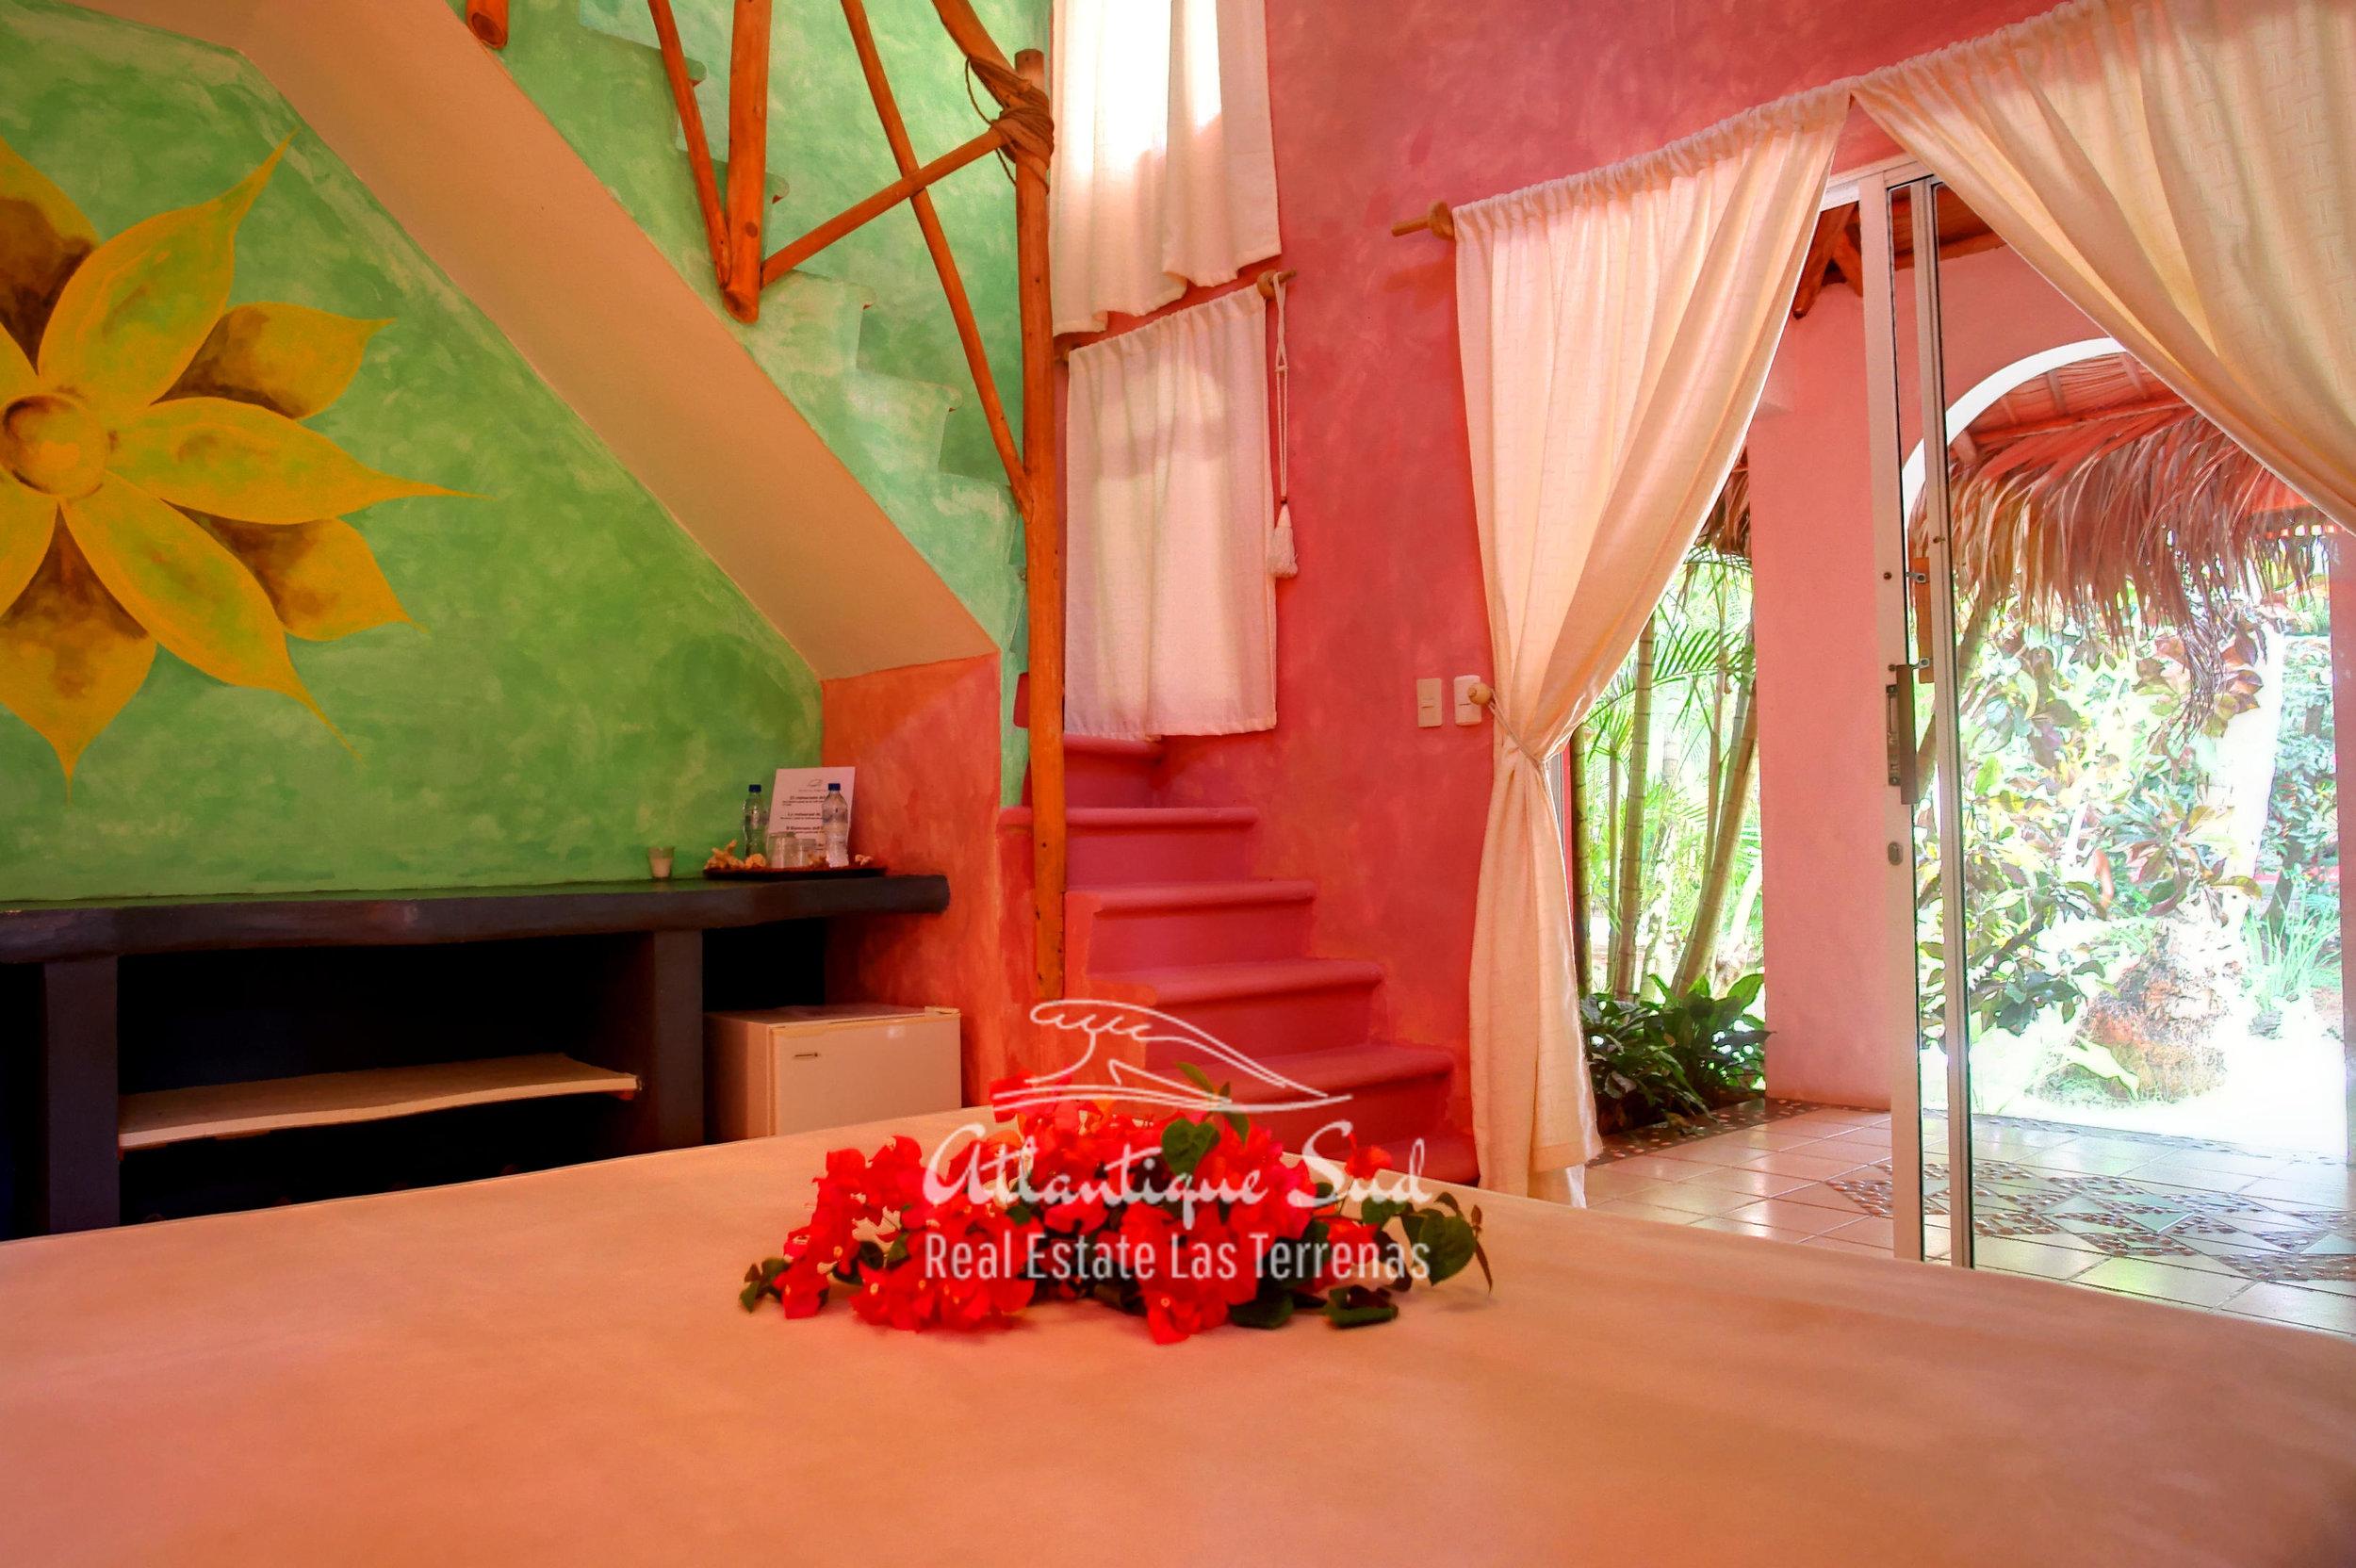 Colourful caribbean hotel in touristic heart Real Estate Las Terrenas Dominican Republic9.jpg